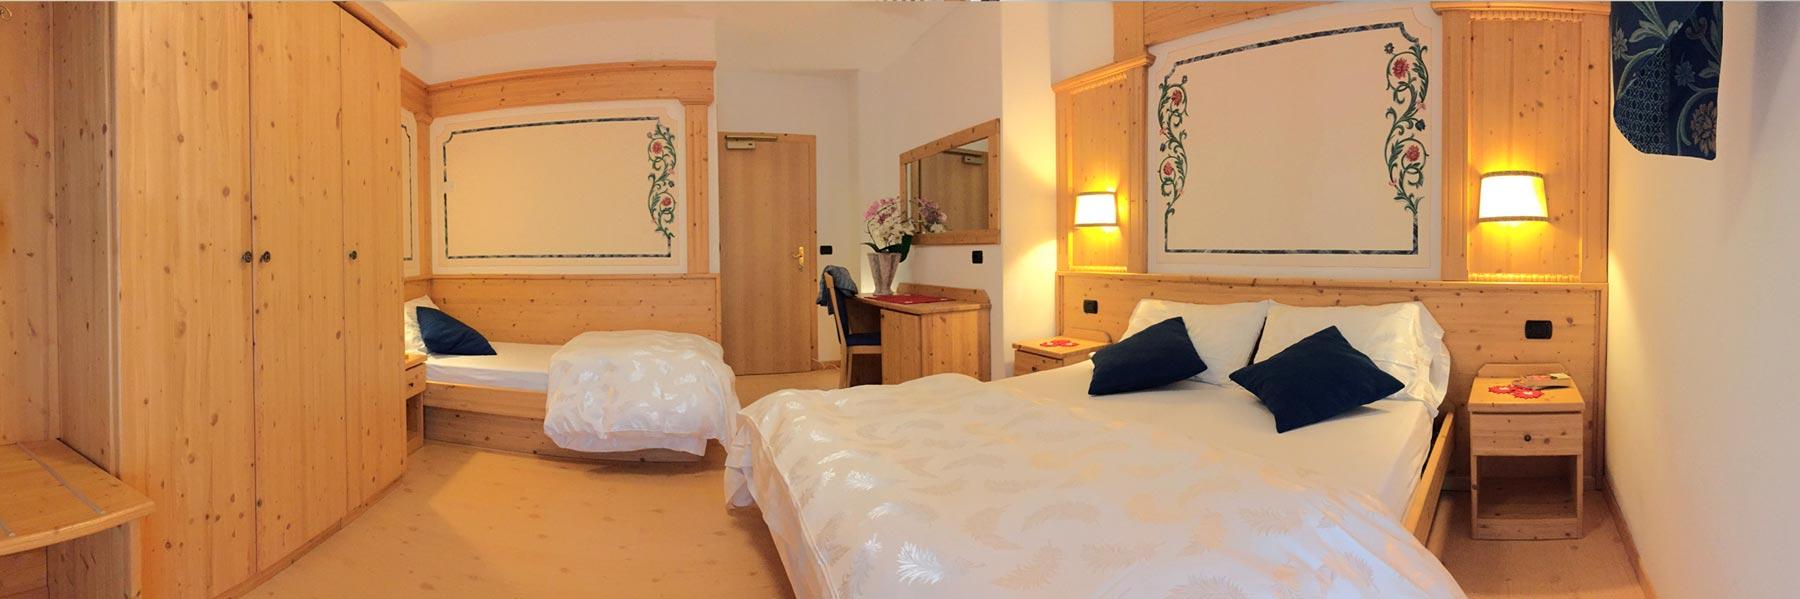 Hotel_miravalle_tripla_ok